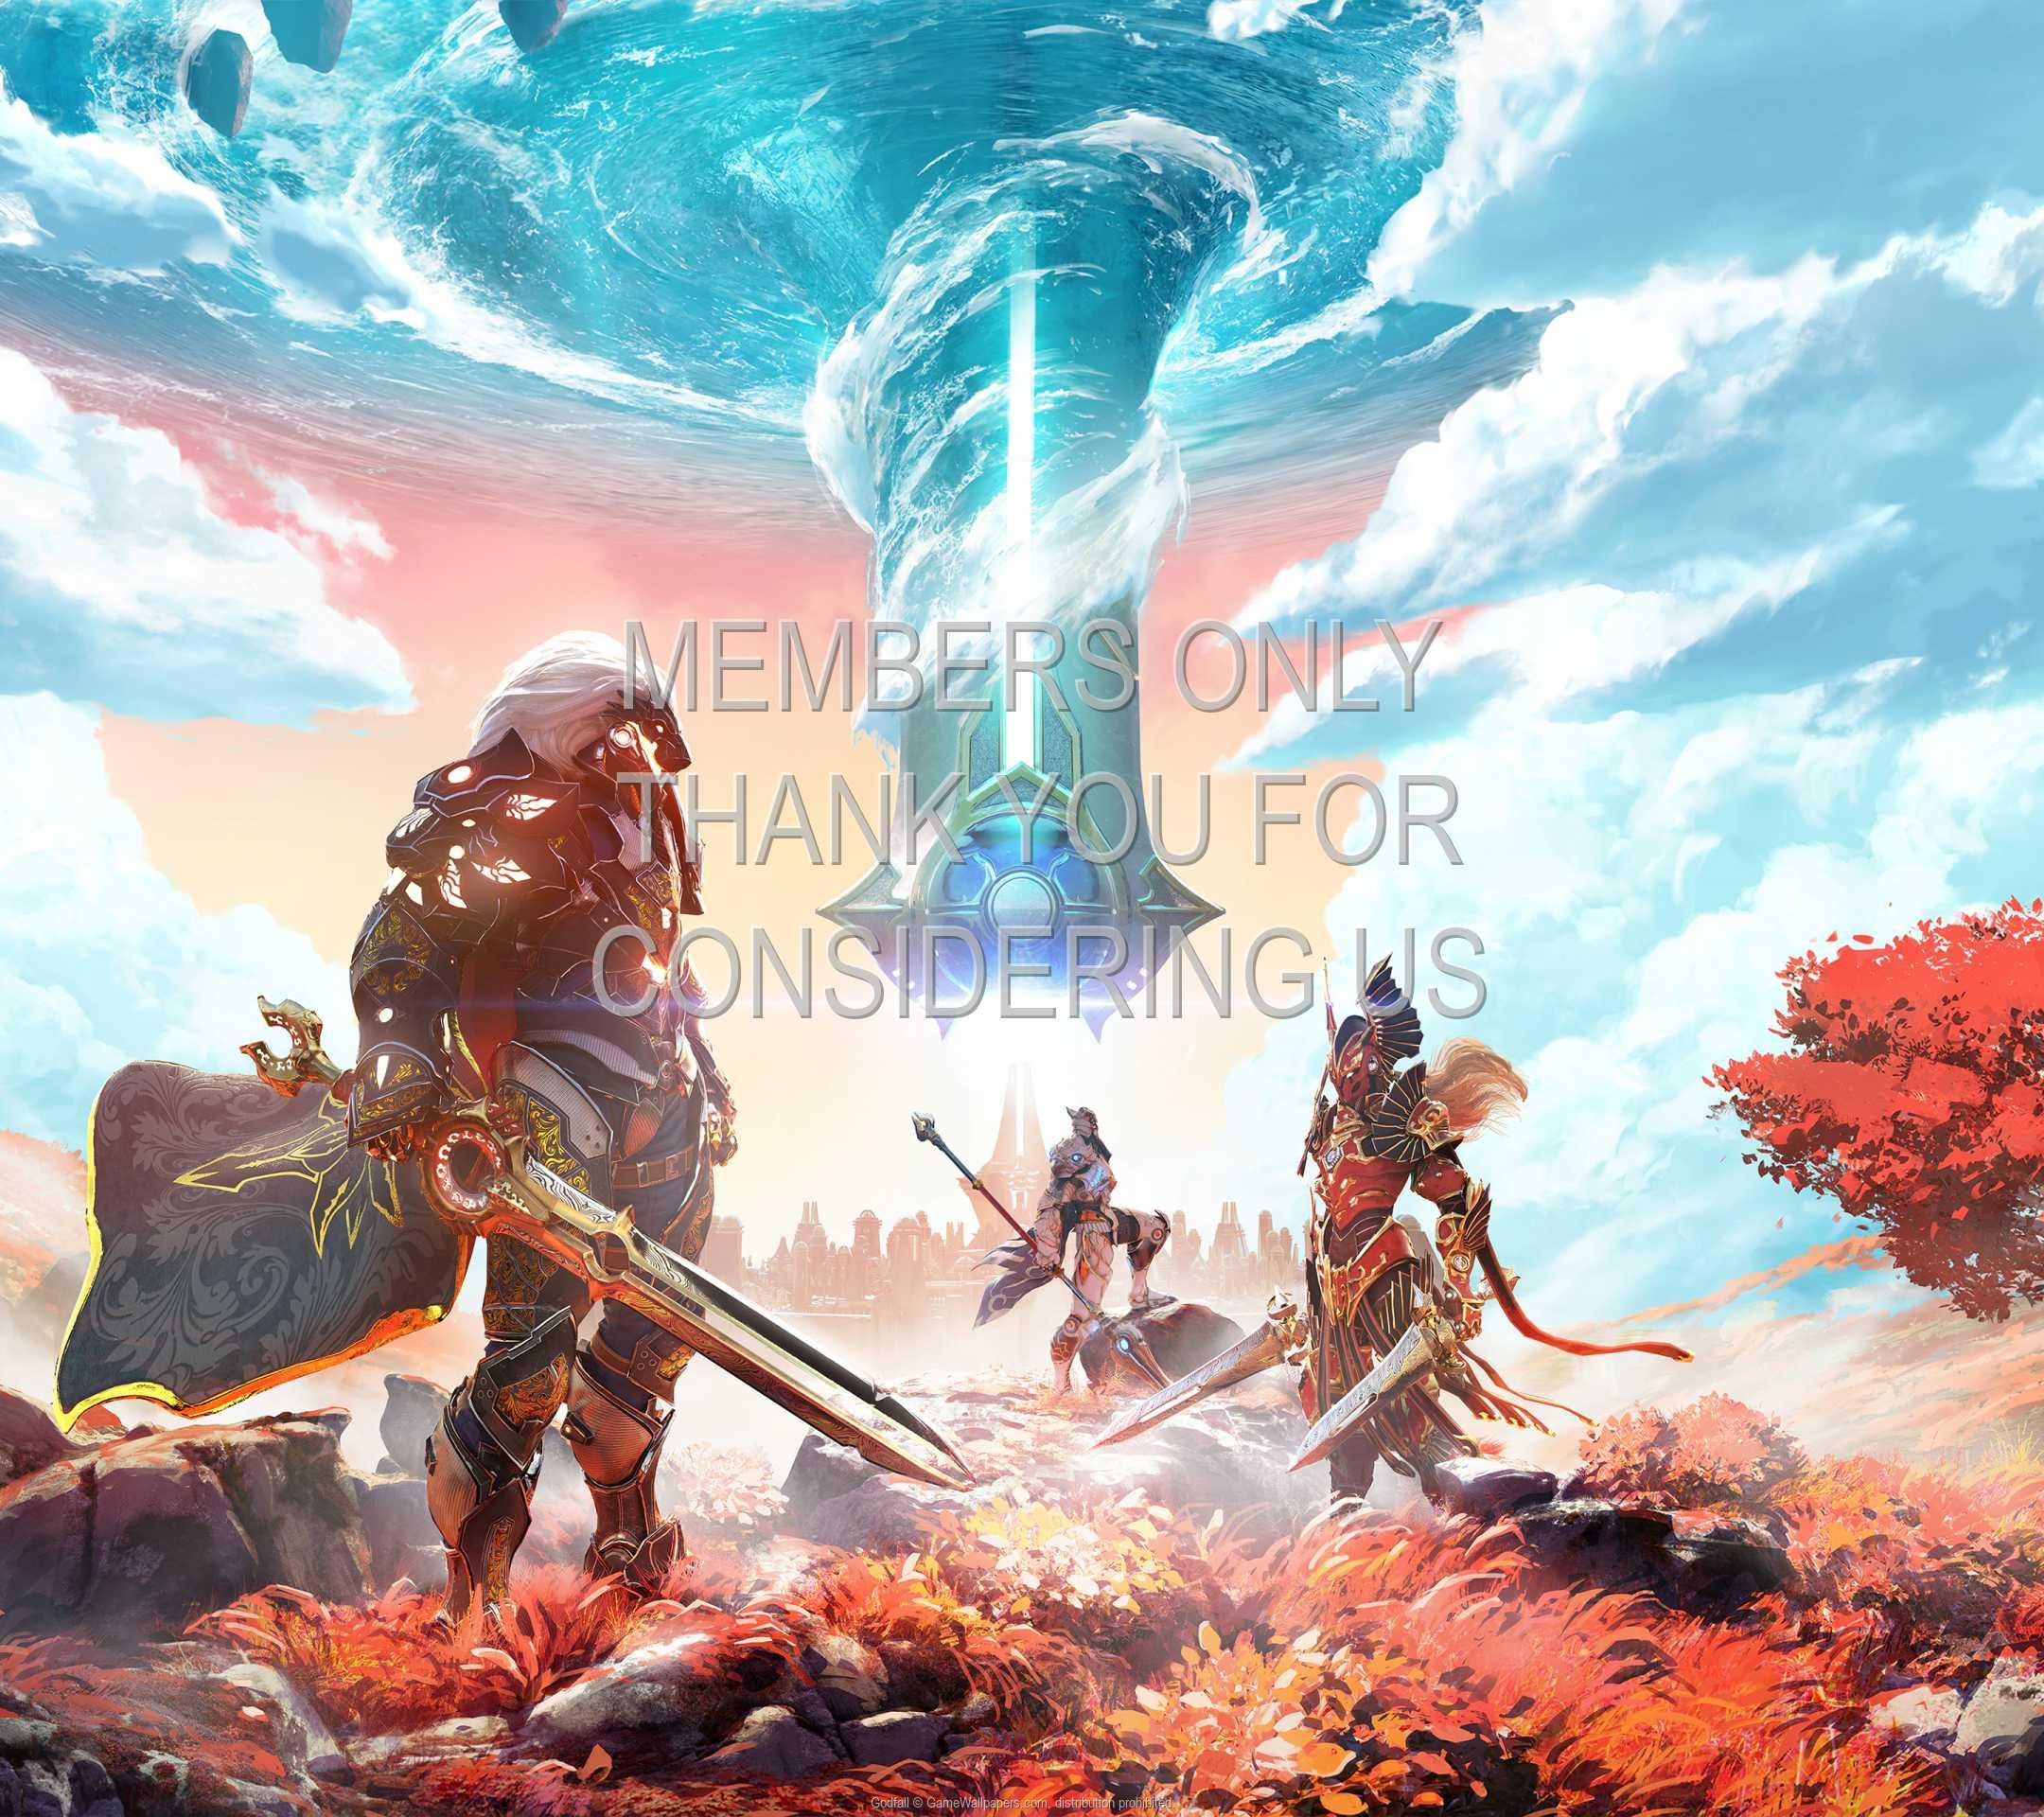 Godfall 1080p Horizontal Mobile wallpaper or background 01